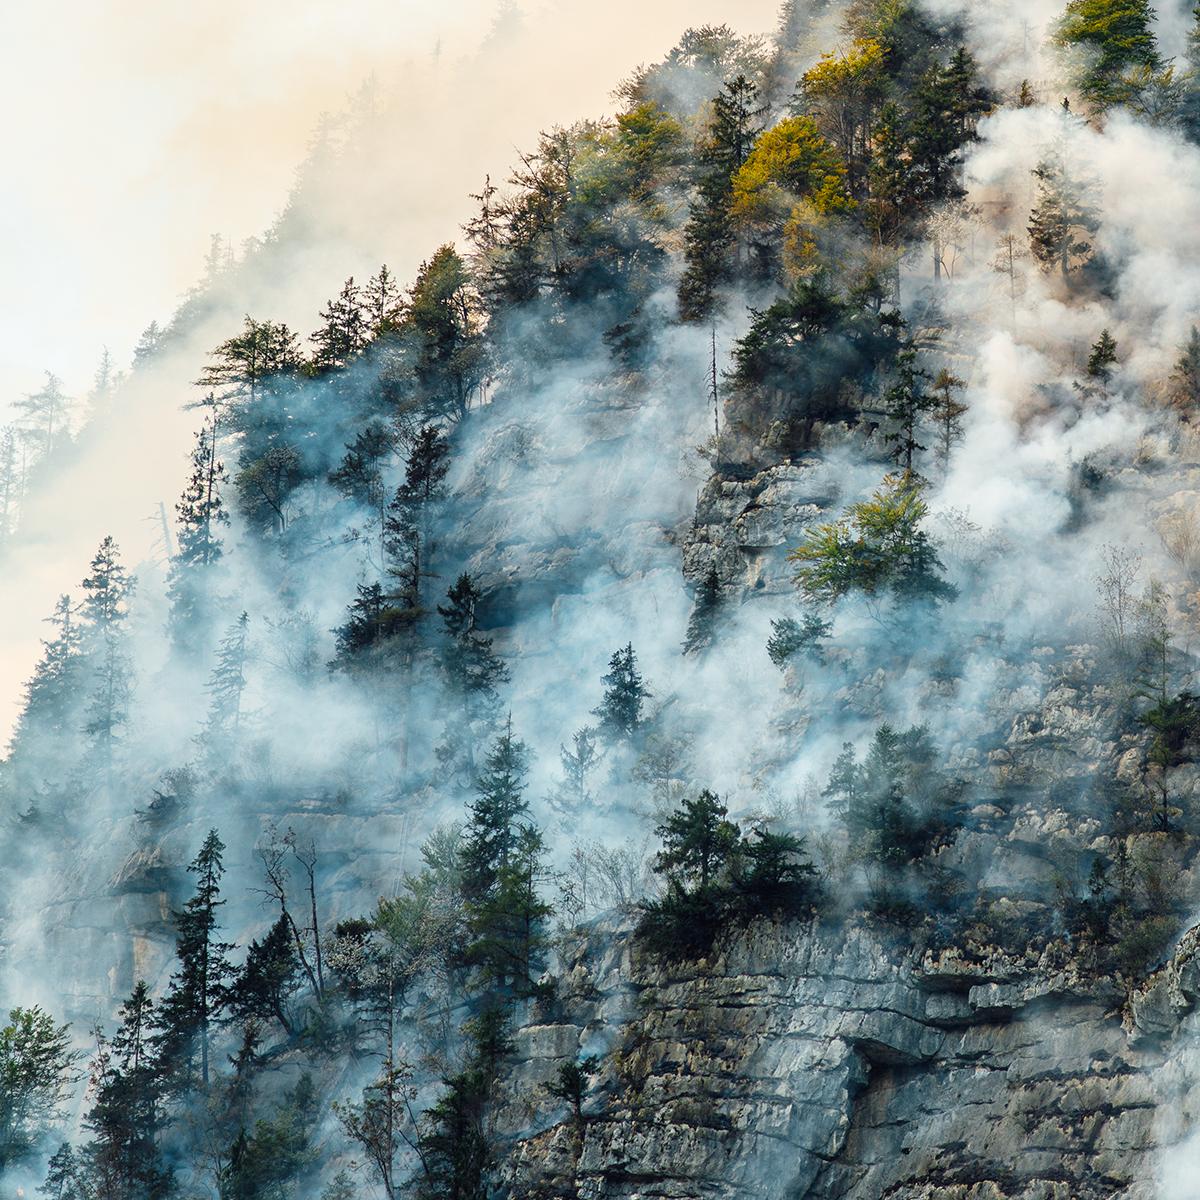 ¿Cómo prevenir incendios forestales? ¡Descubre las mejores técnicas!